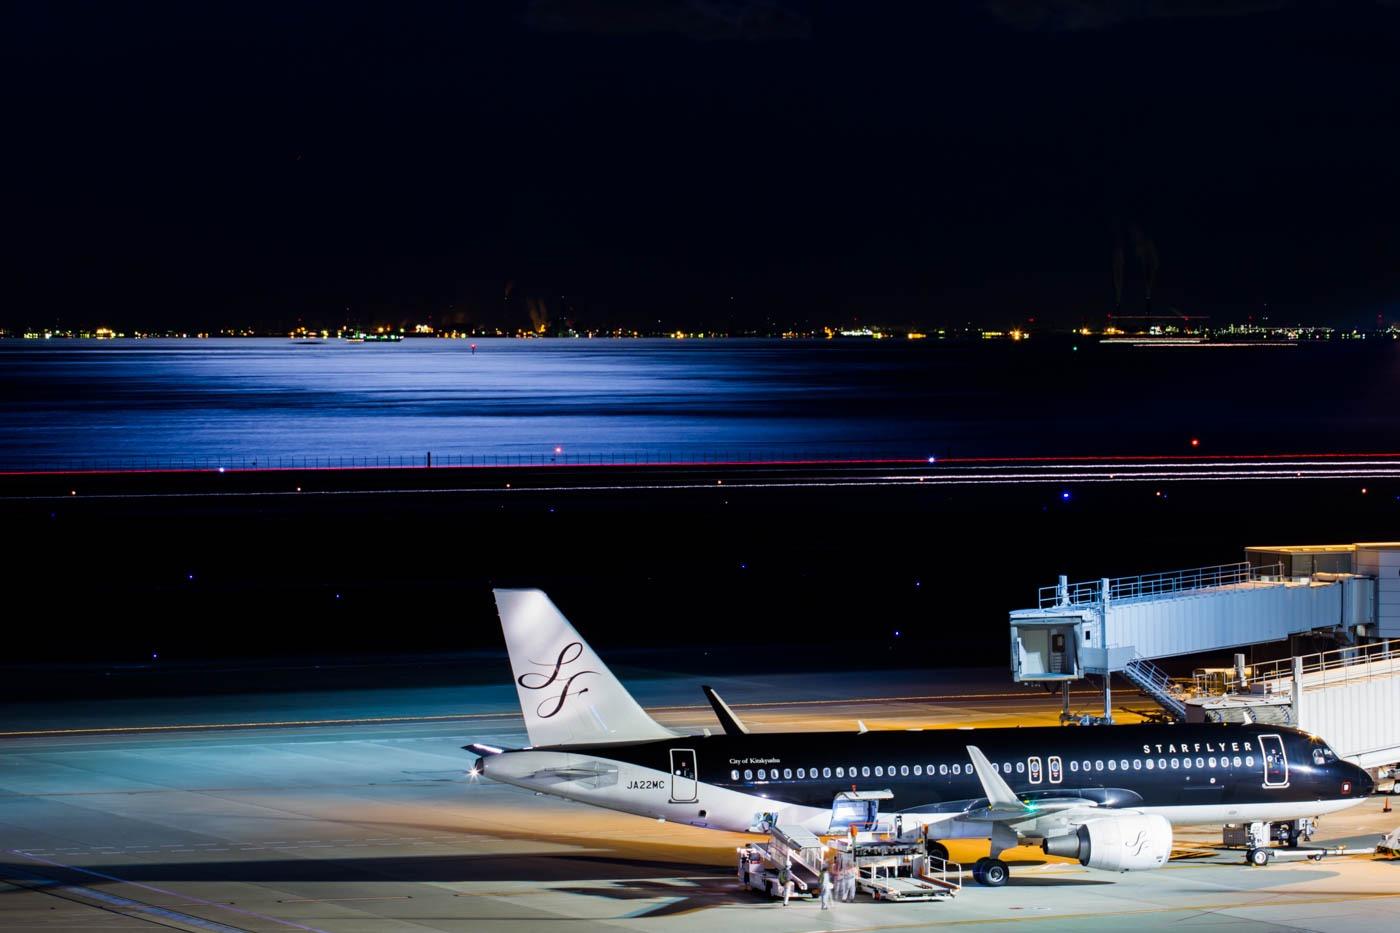 StarFlyer Airbus A320-200 at Tokyo Haneda Airport